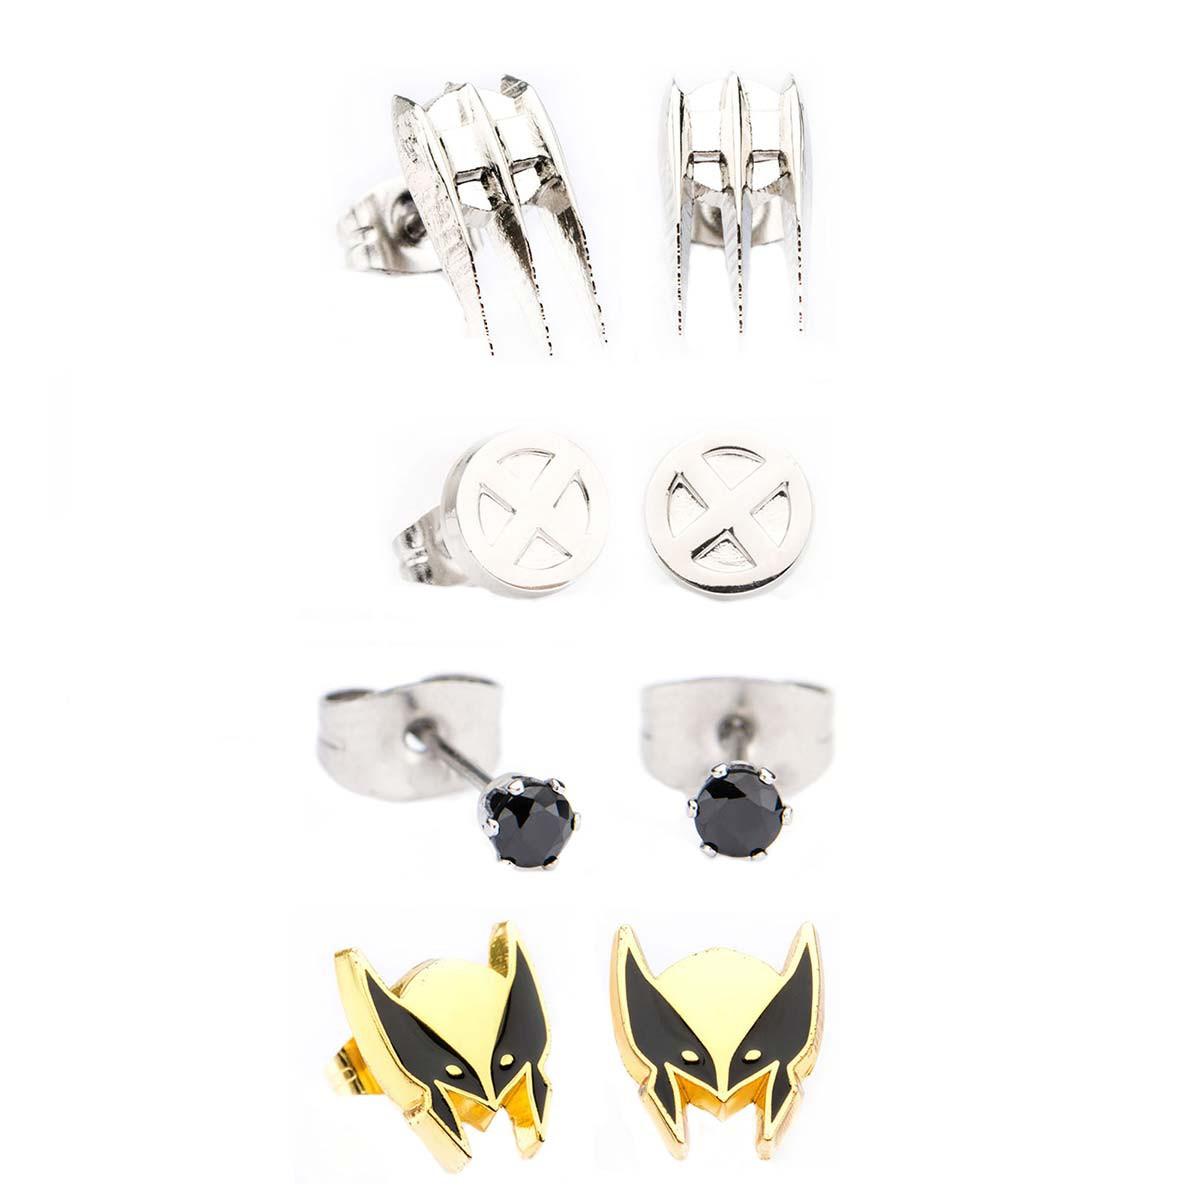 Wolverine Stud Earring Set